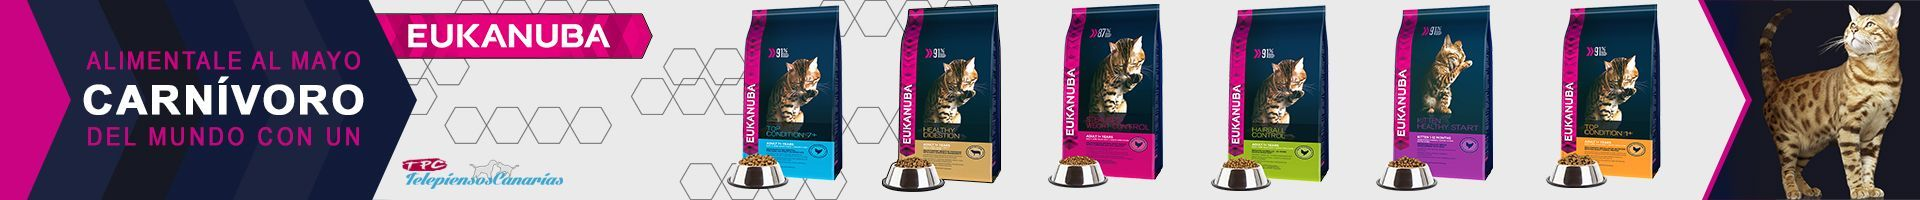 Eukanuba pienso gatos tenerife TelepiensosCanarias 7 5 2018 155443